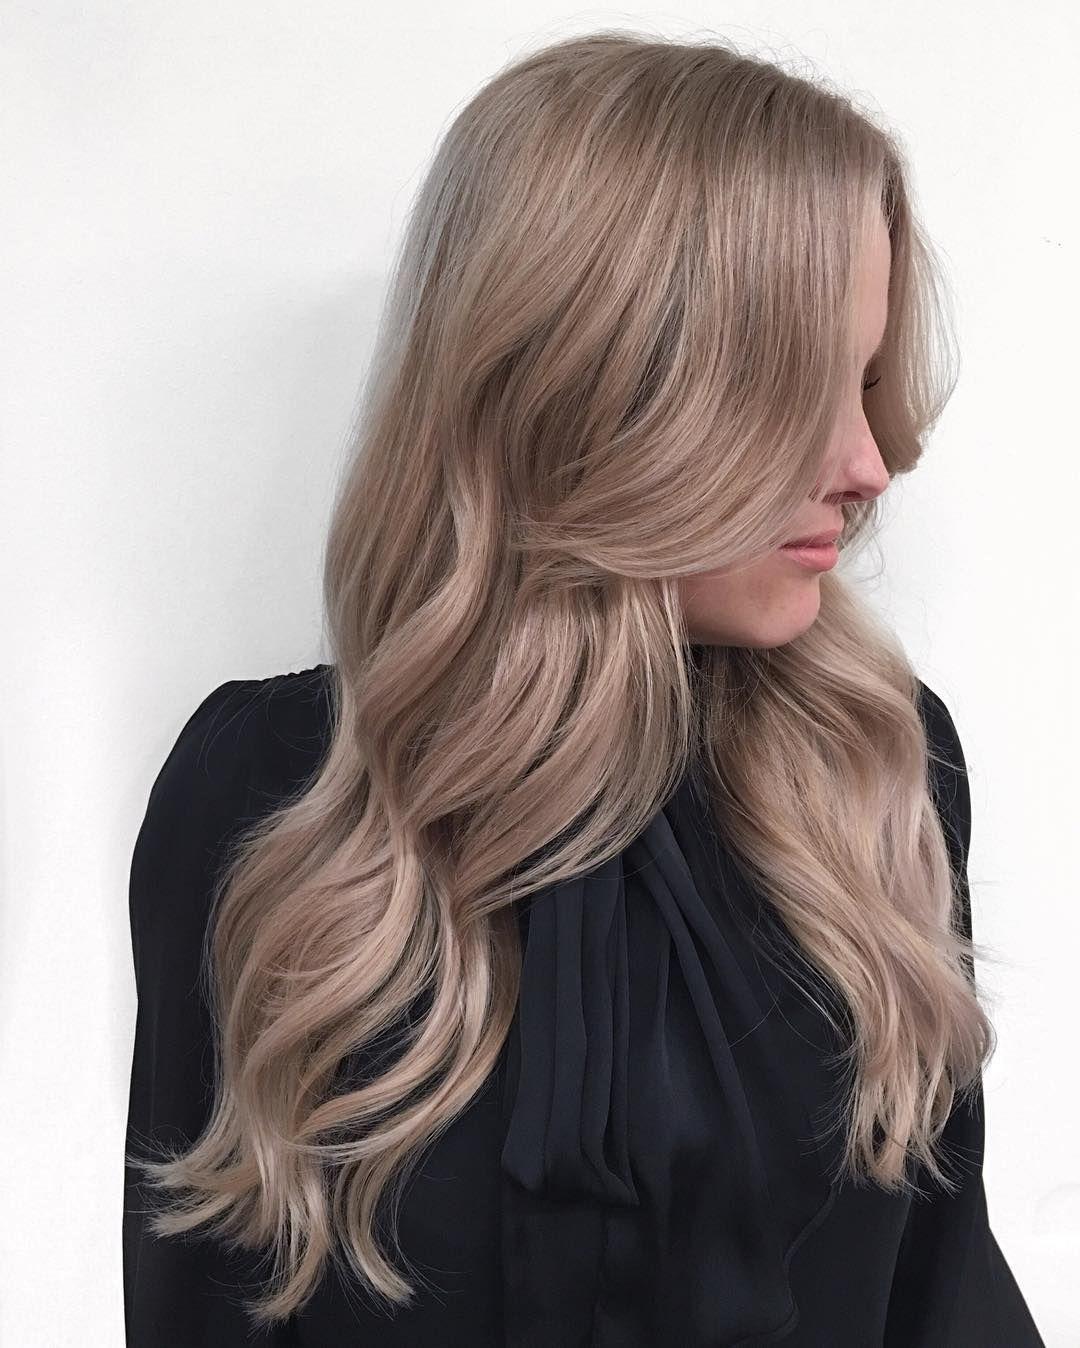 50 Stunning Light And Dark Ash Blonde Hair Color Ideas Trending Now Dark Ash Blonde Hair Beige Blonde Hair Ash Blonde Hair